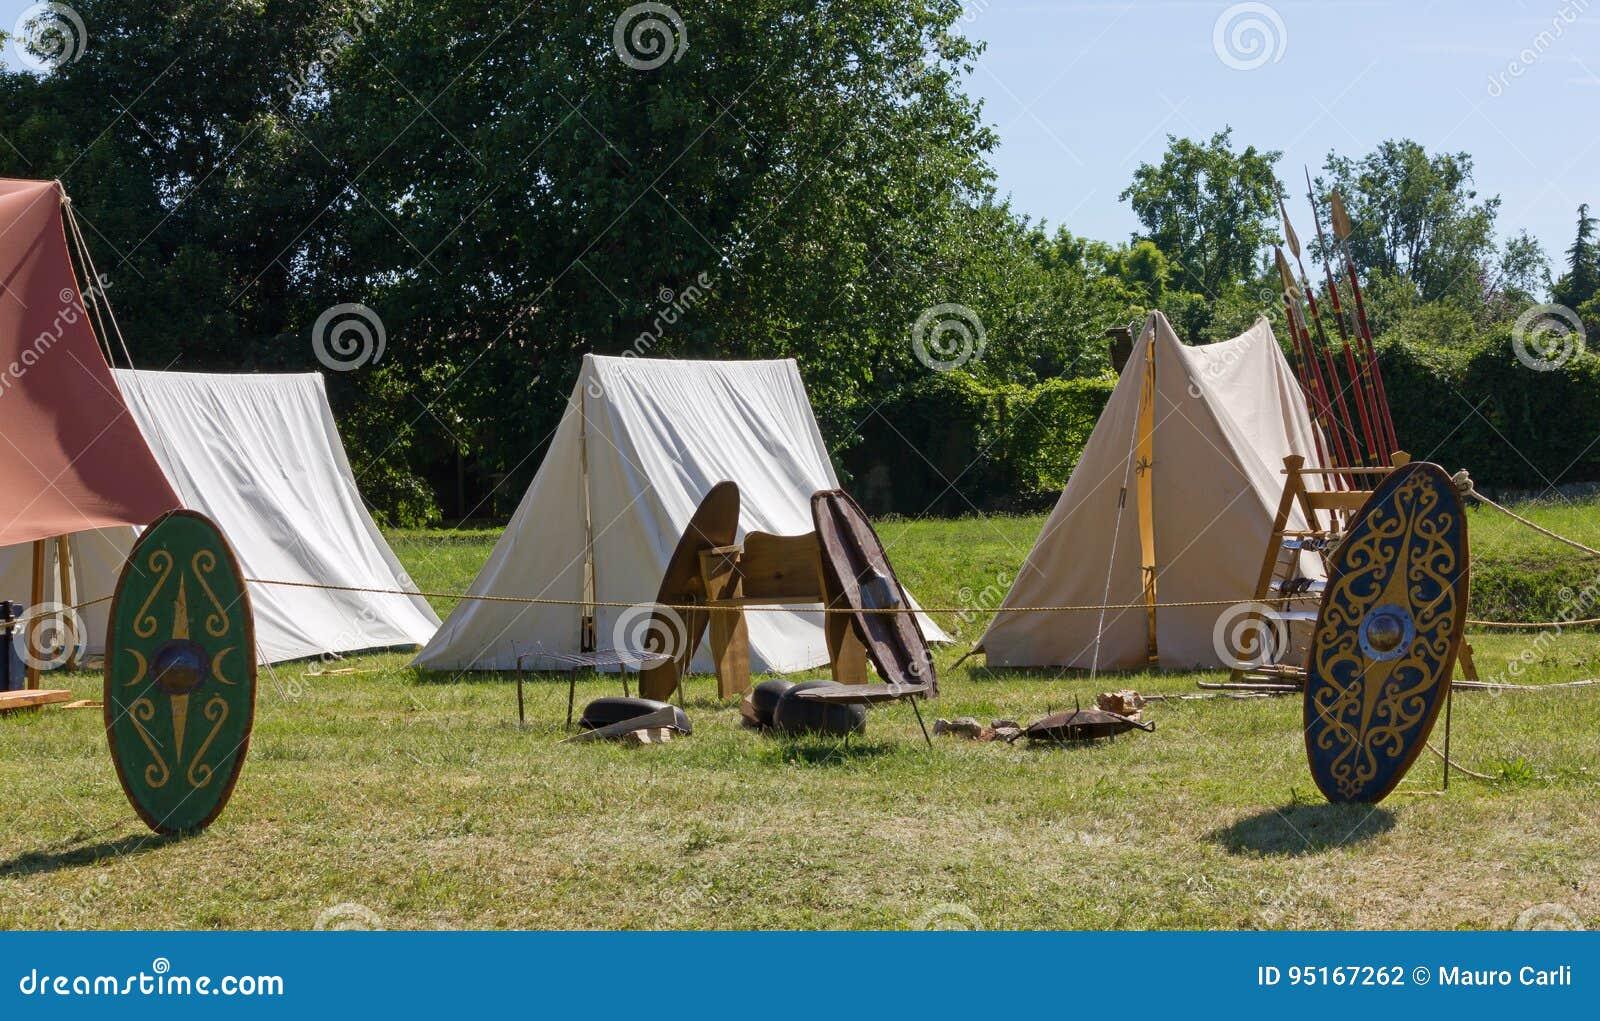 Campement gallique antique à une reconstitution